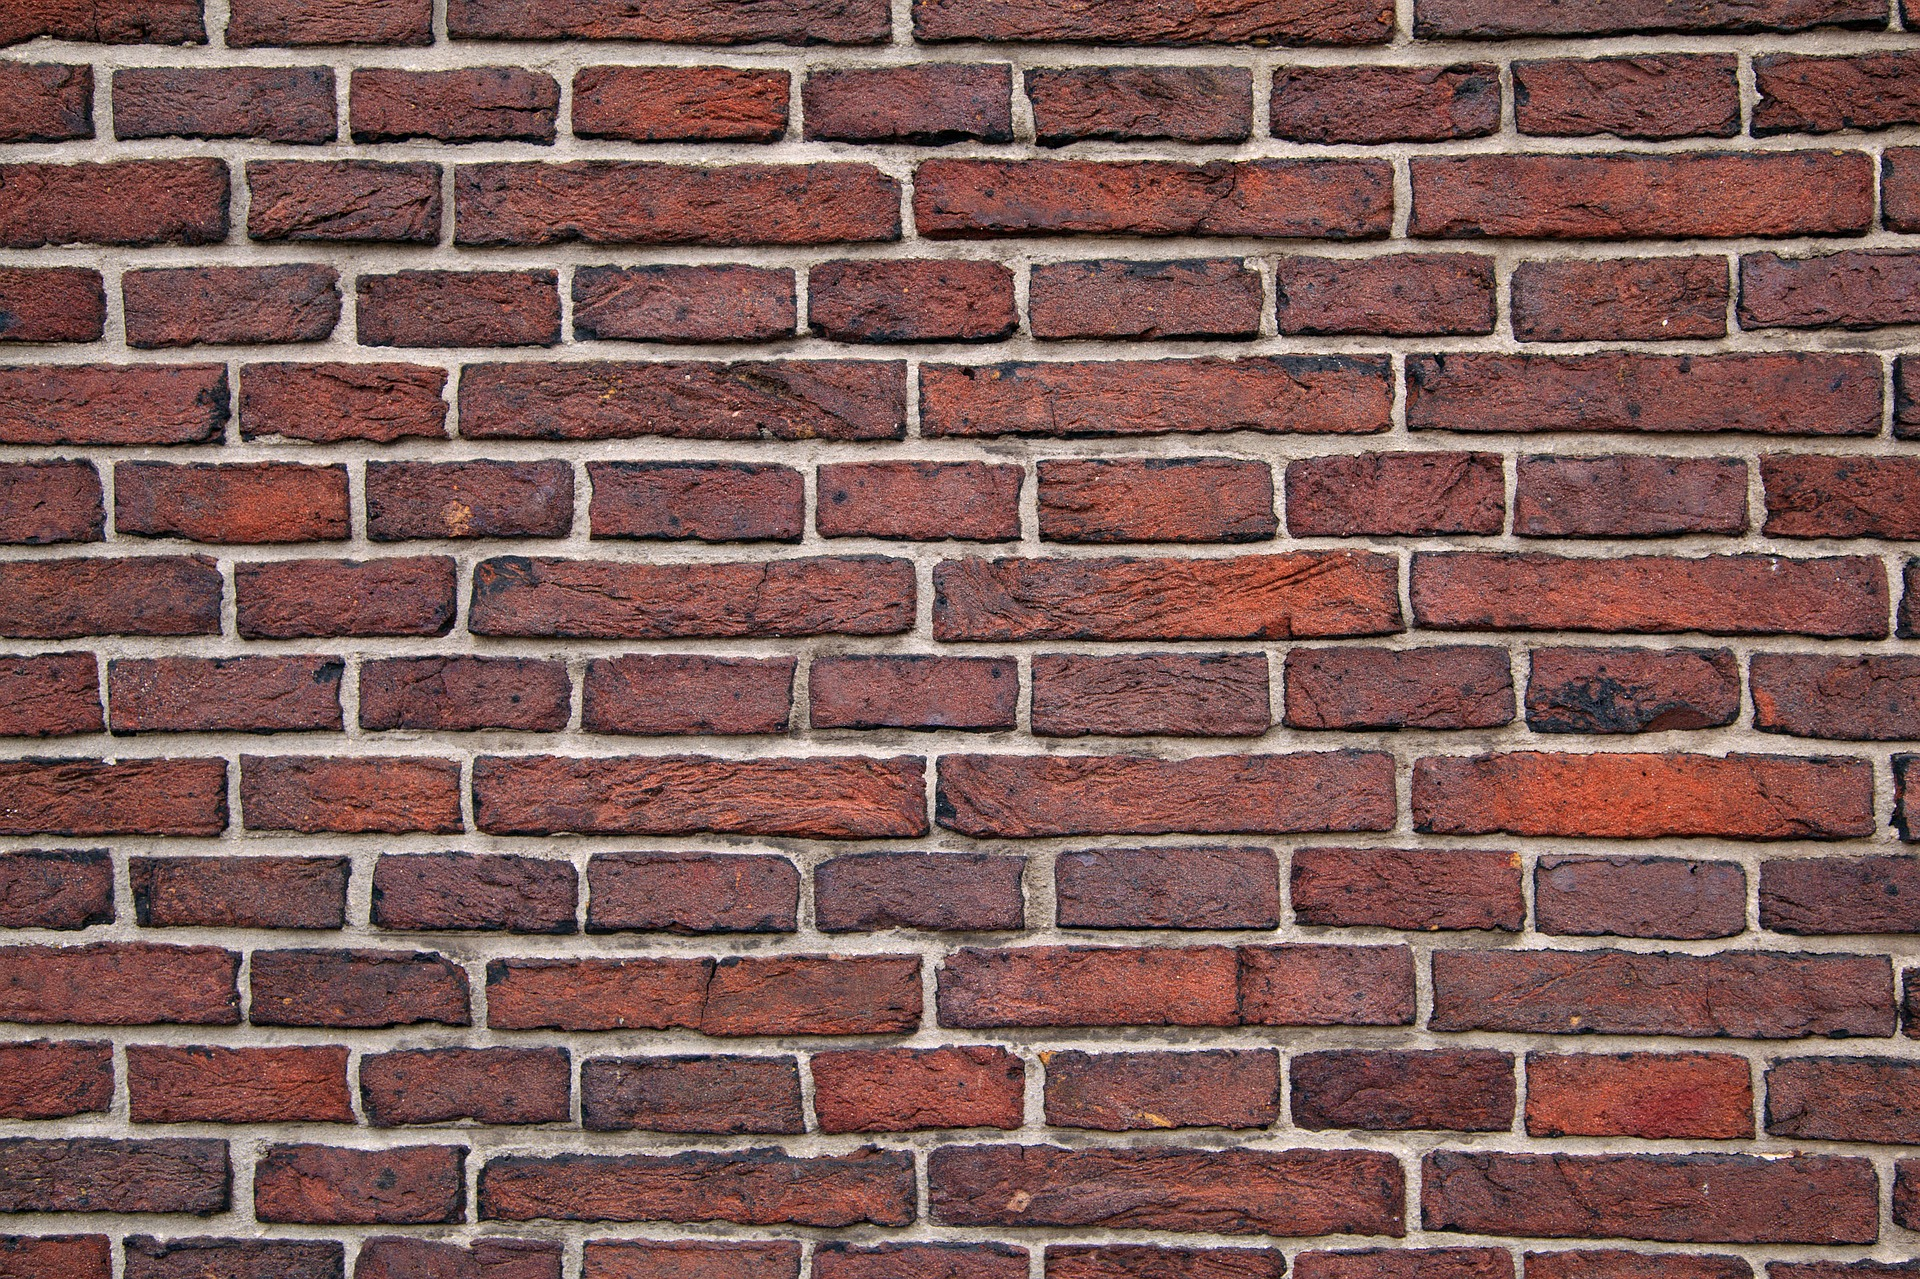 Wall Texture, Architecture, Brick, Building, Construction, HQ Photo